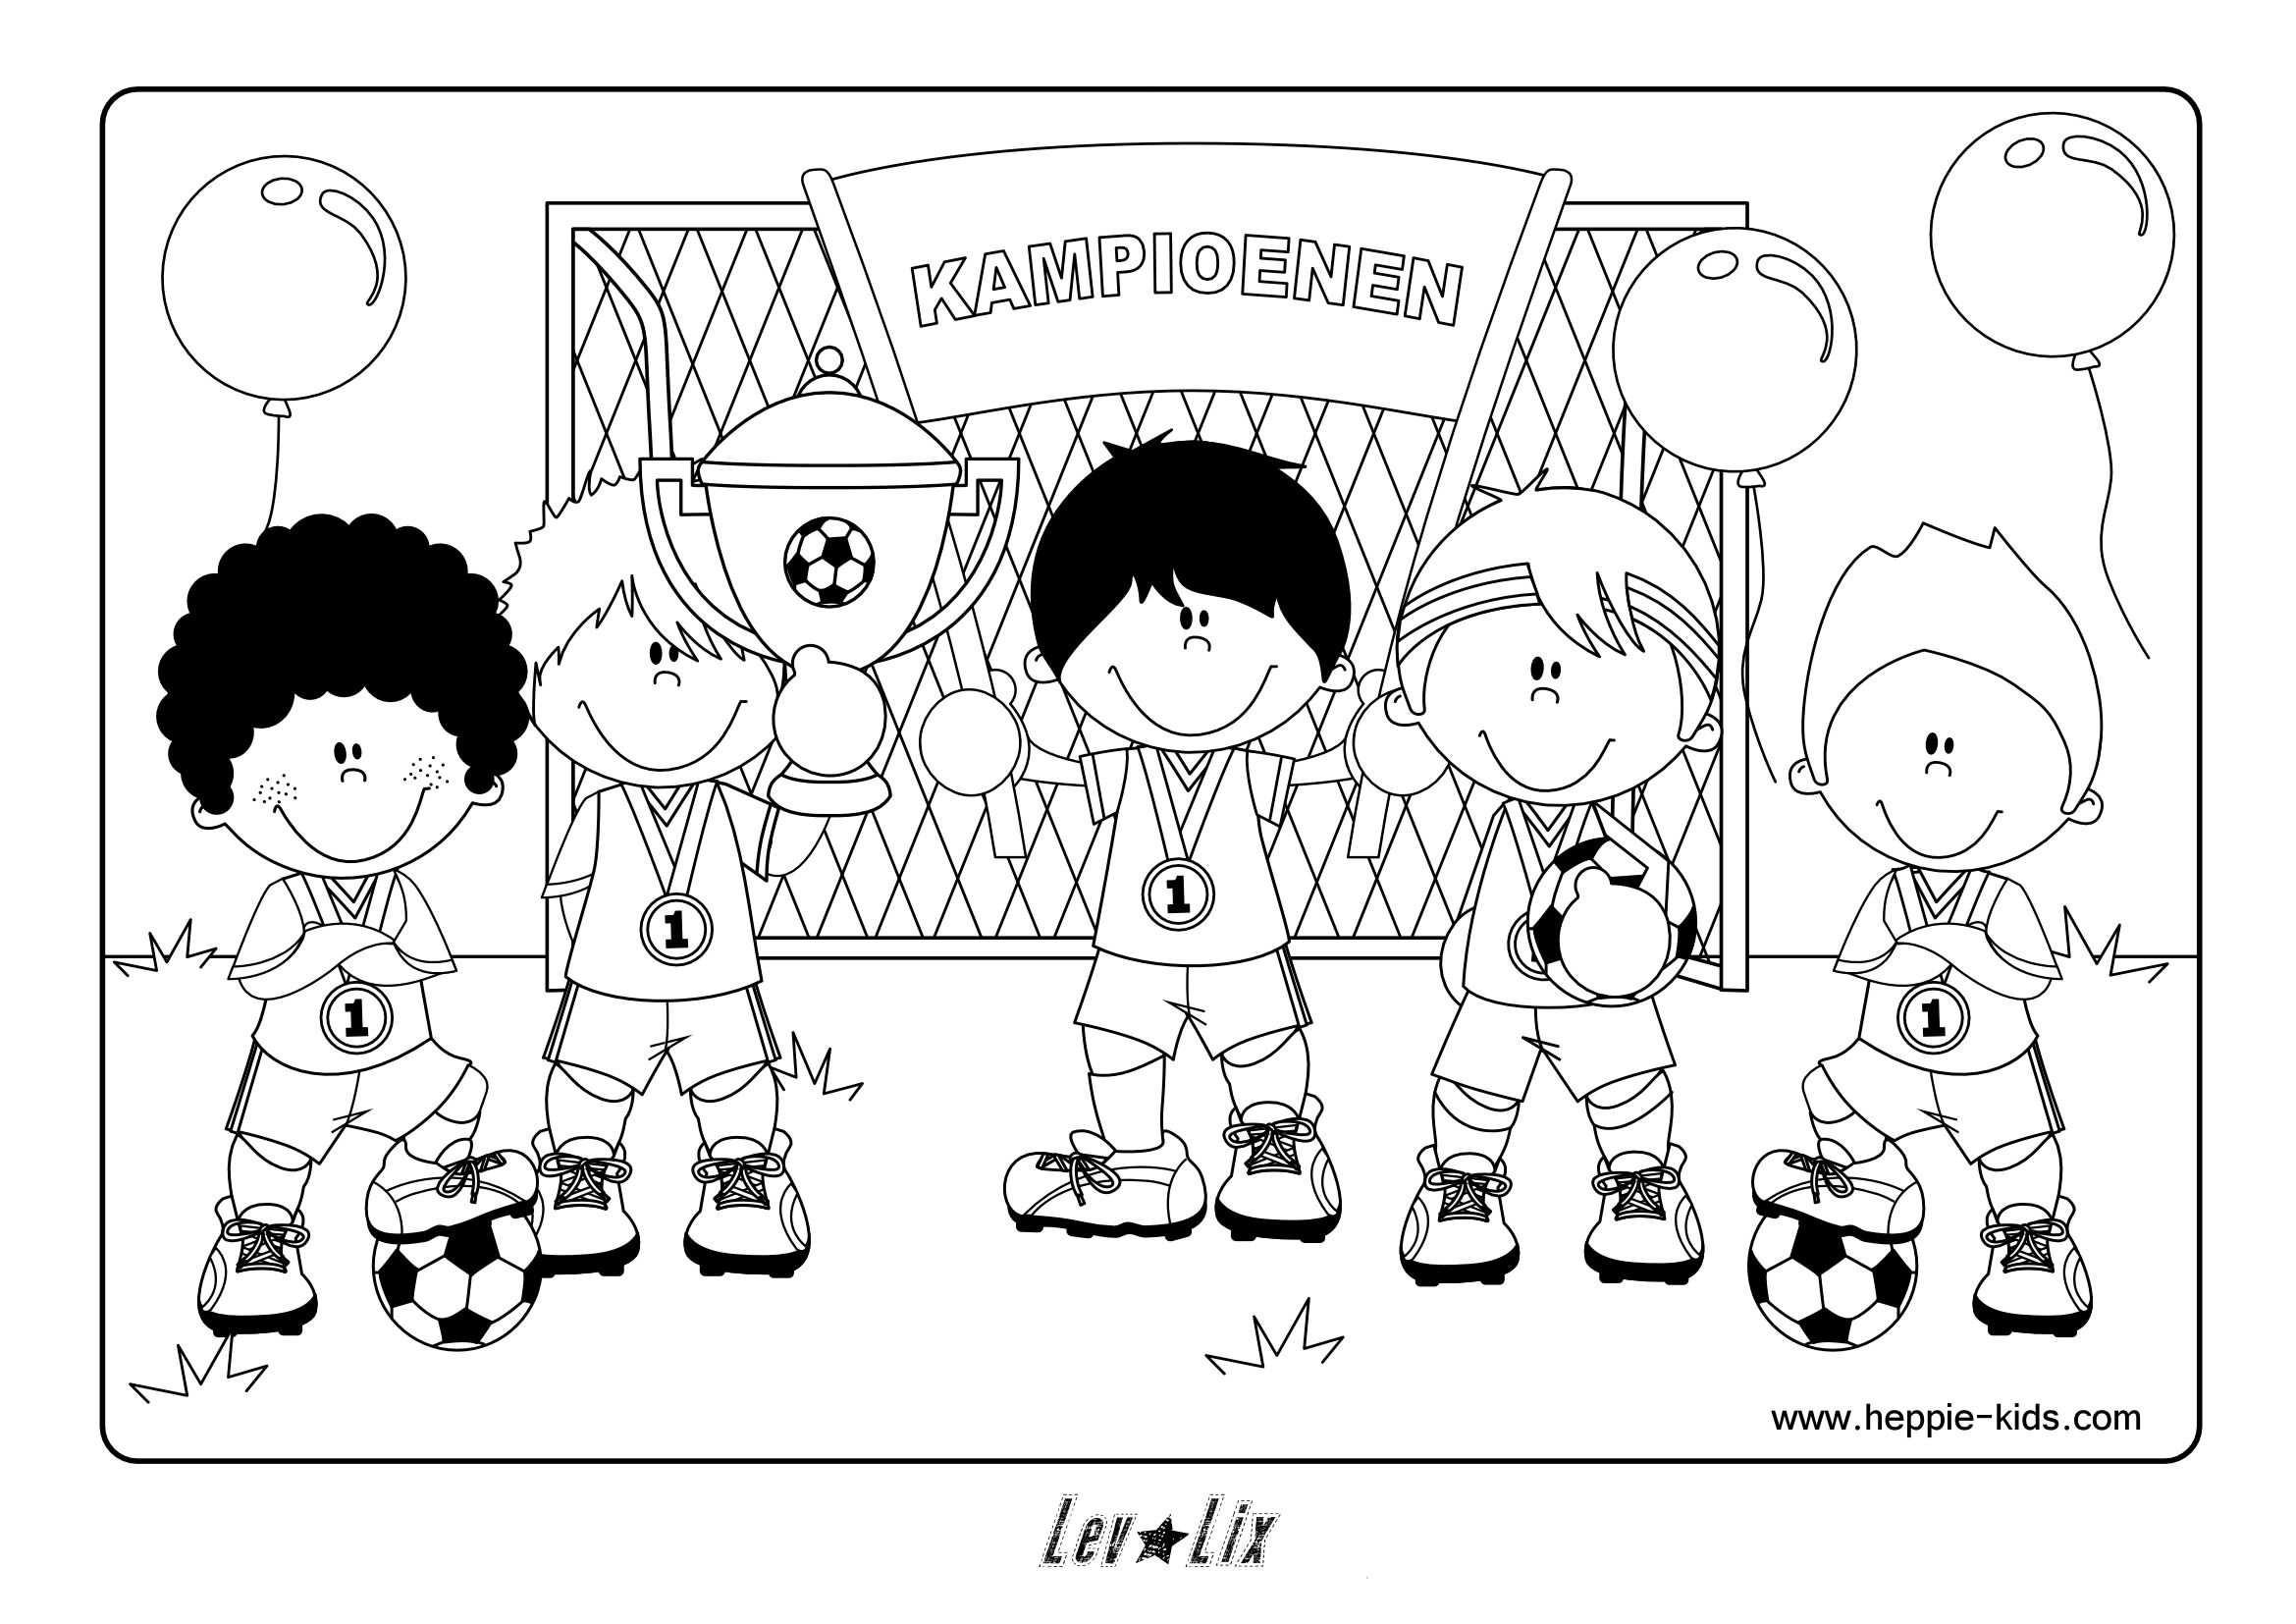 Kleurplaat Voetbal Www Heppie Kids Com Kleurplaten Voetbal Thema